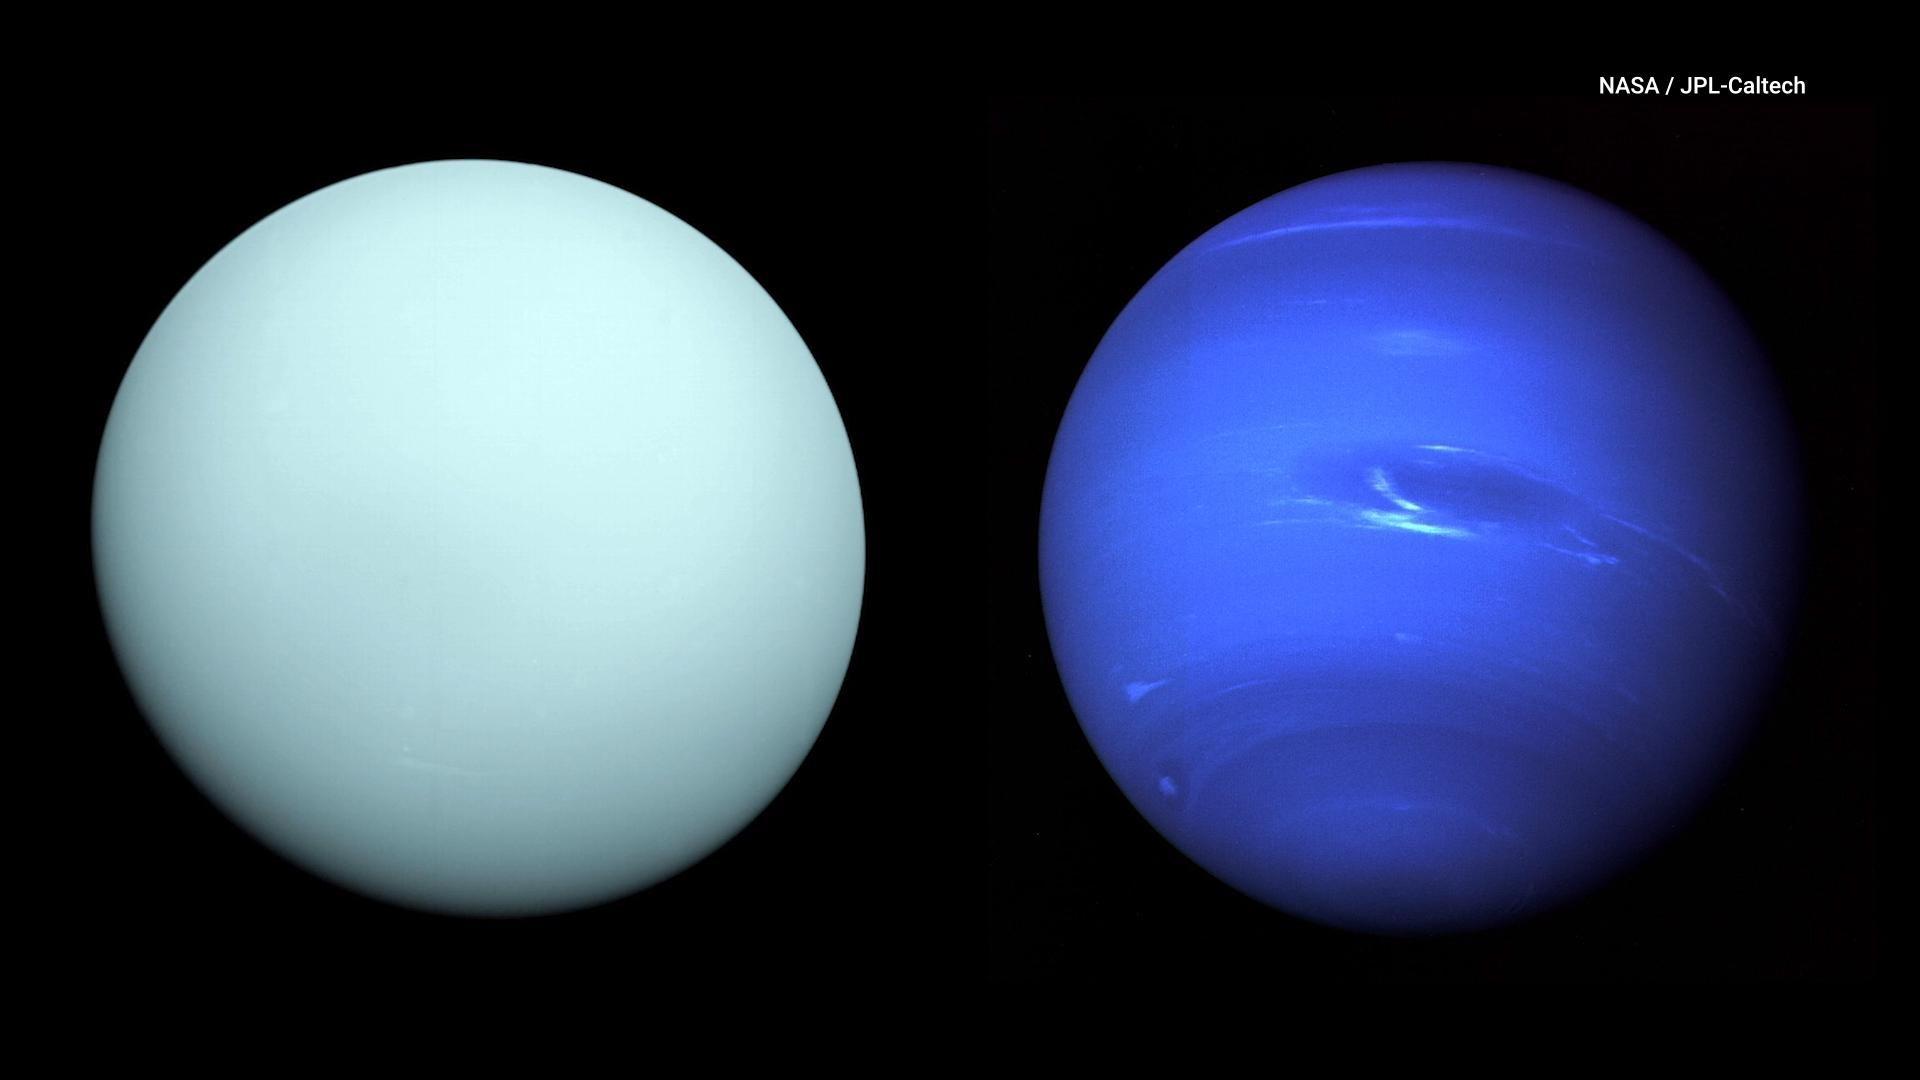 Uranus will be visible to the naked eye across the UK